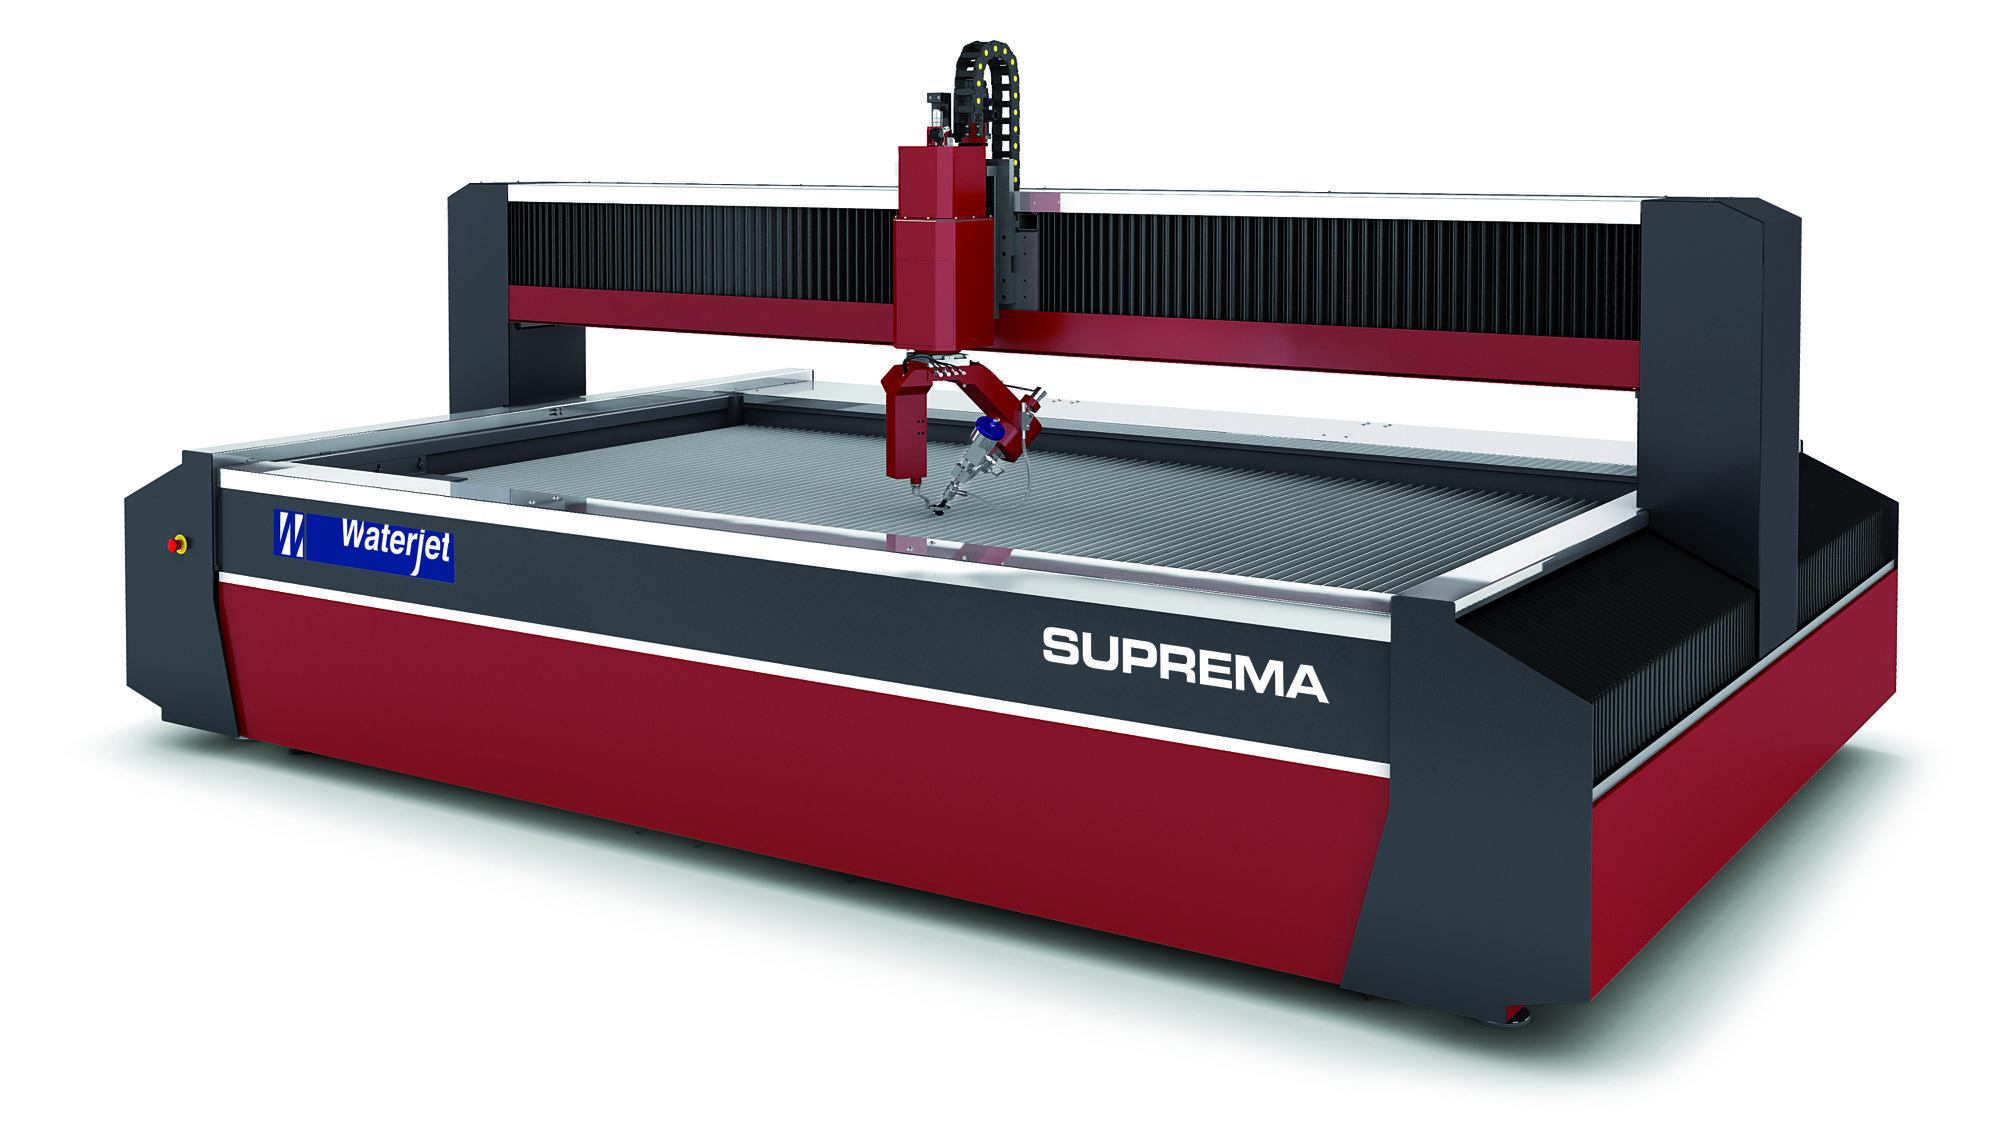 SUPREMA X5 NEW